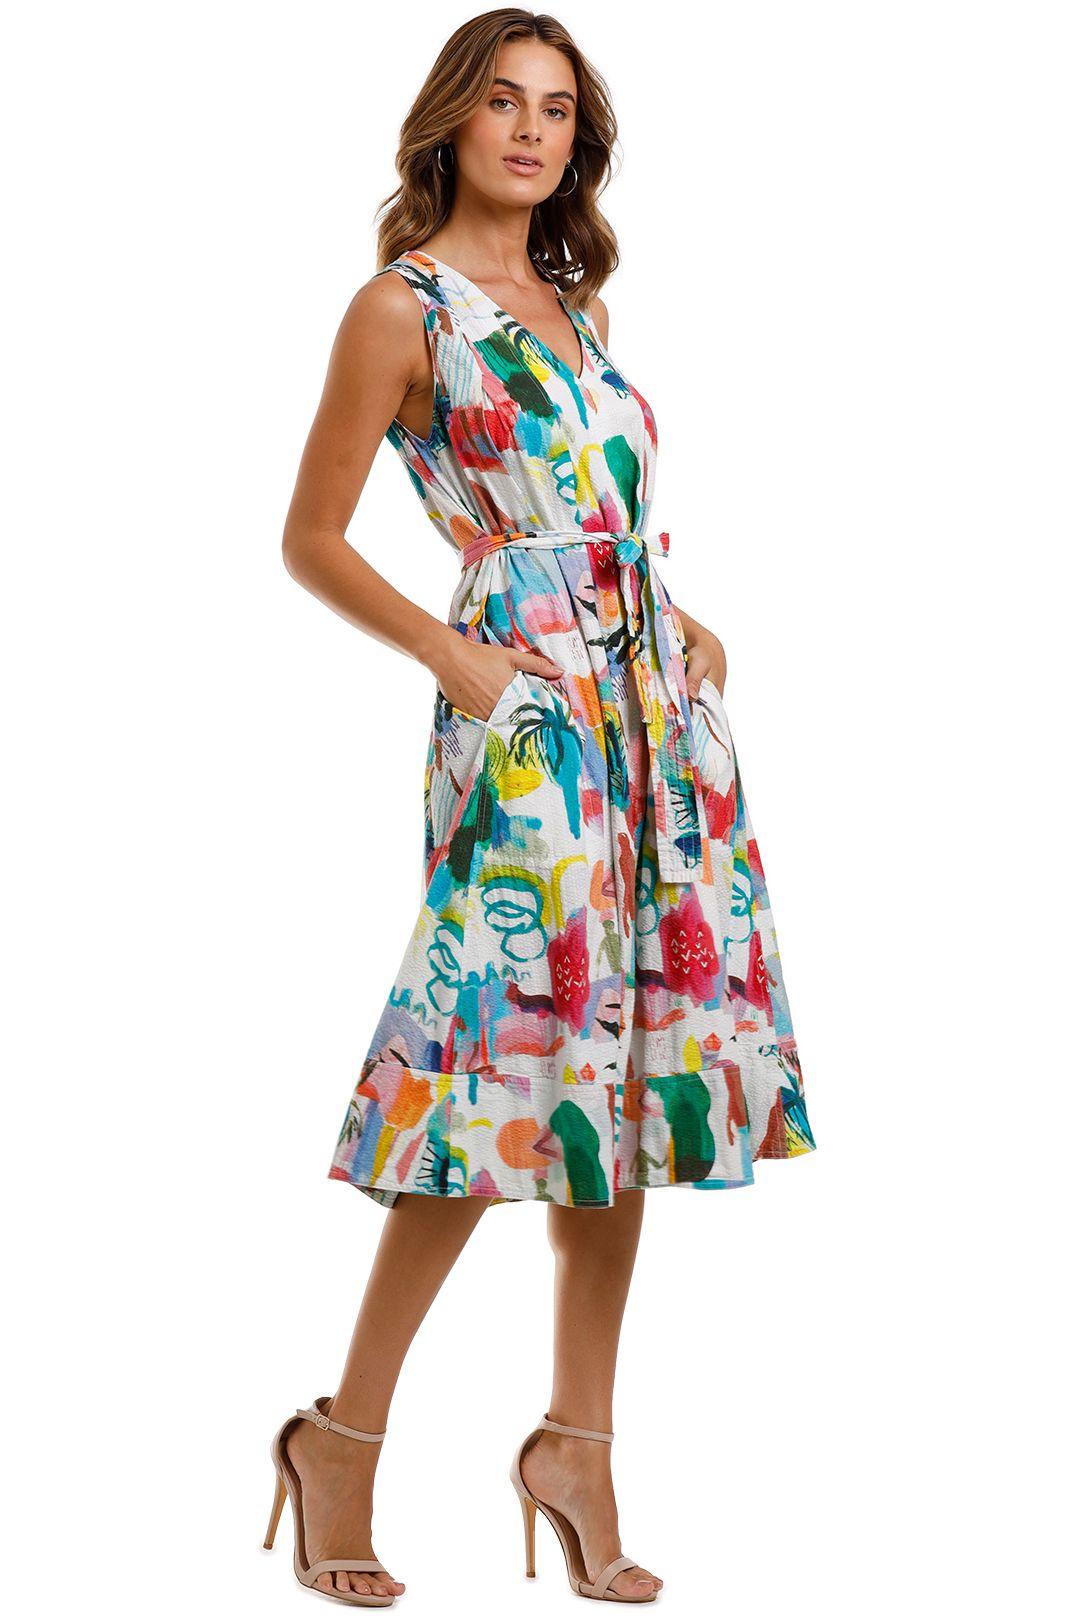 Gorman Shadow Pattern Dress V-neckline